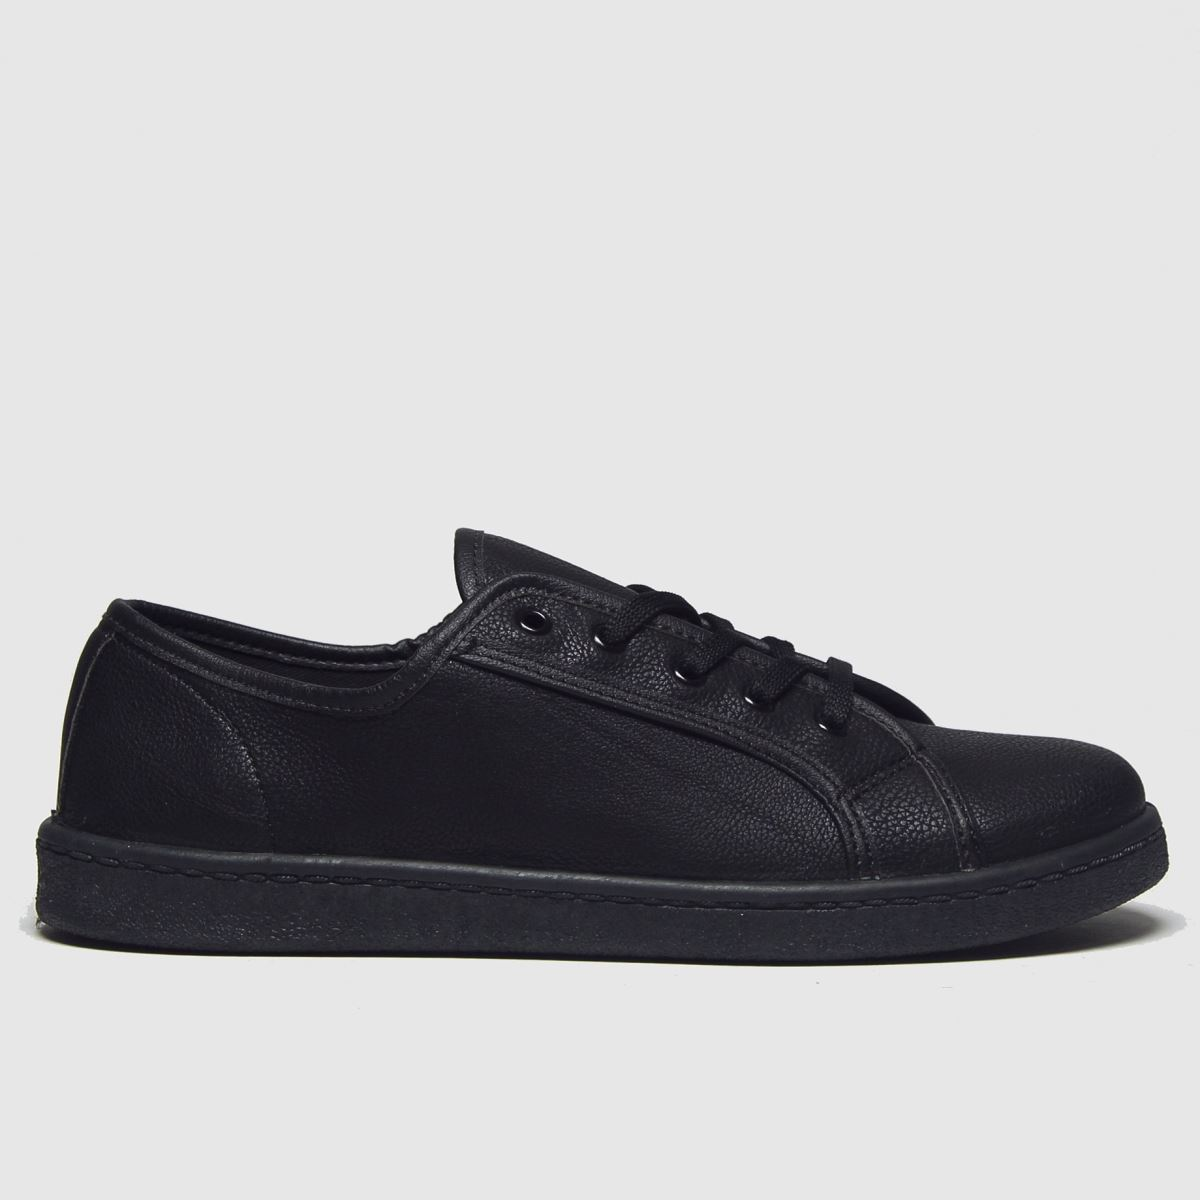 schuh Schuh Black Fun Times Lace Up Flat Shoes